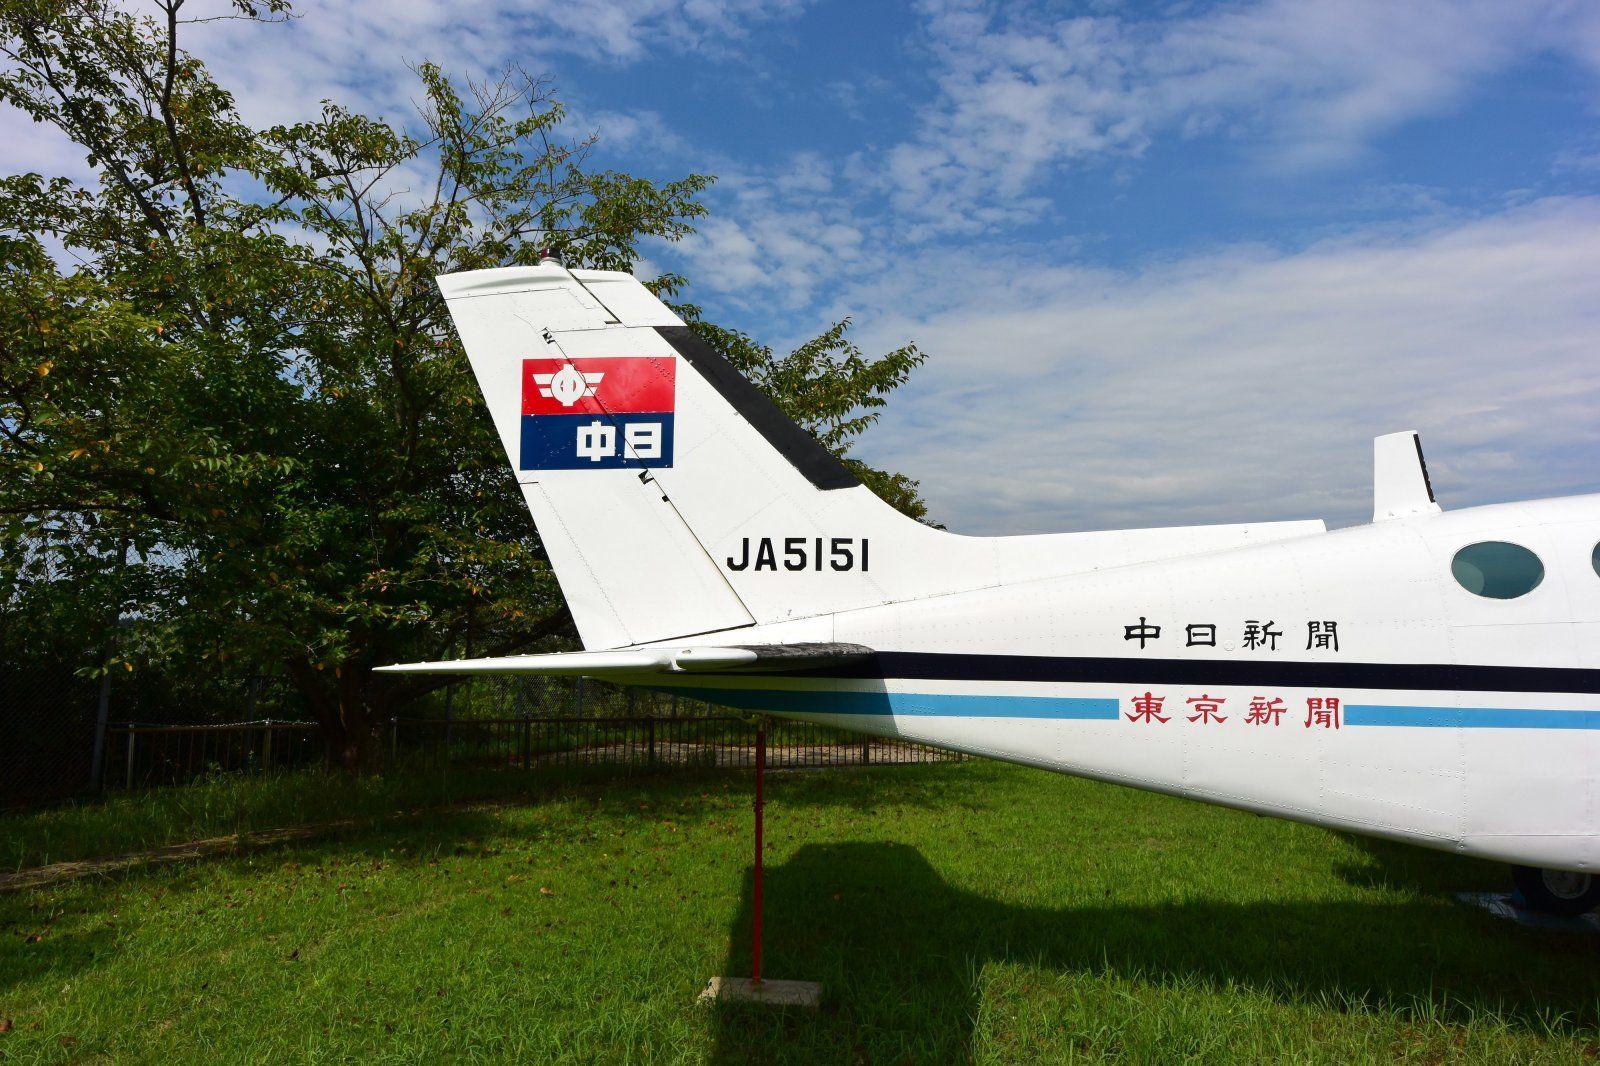 DSC_7594.JPG